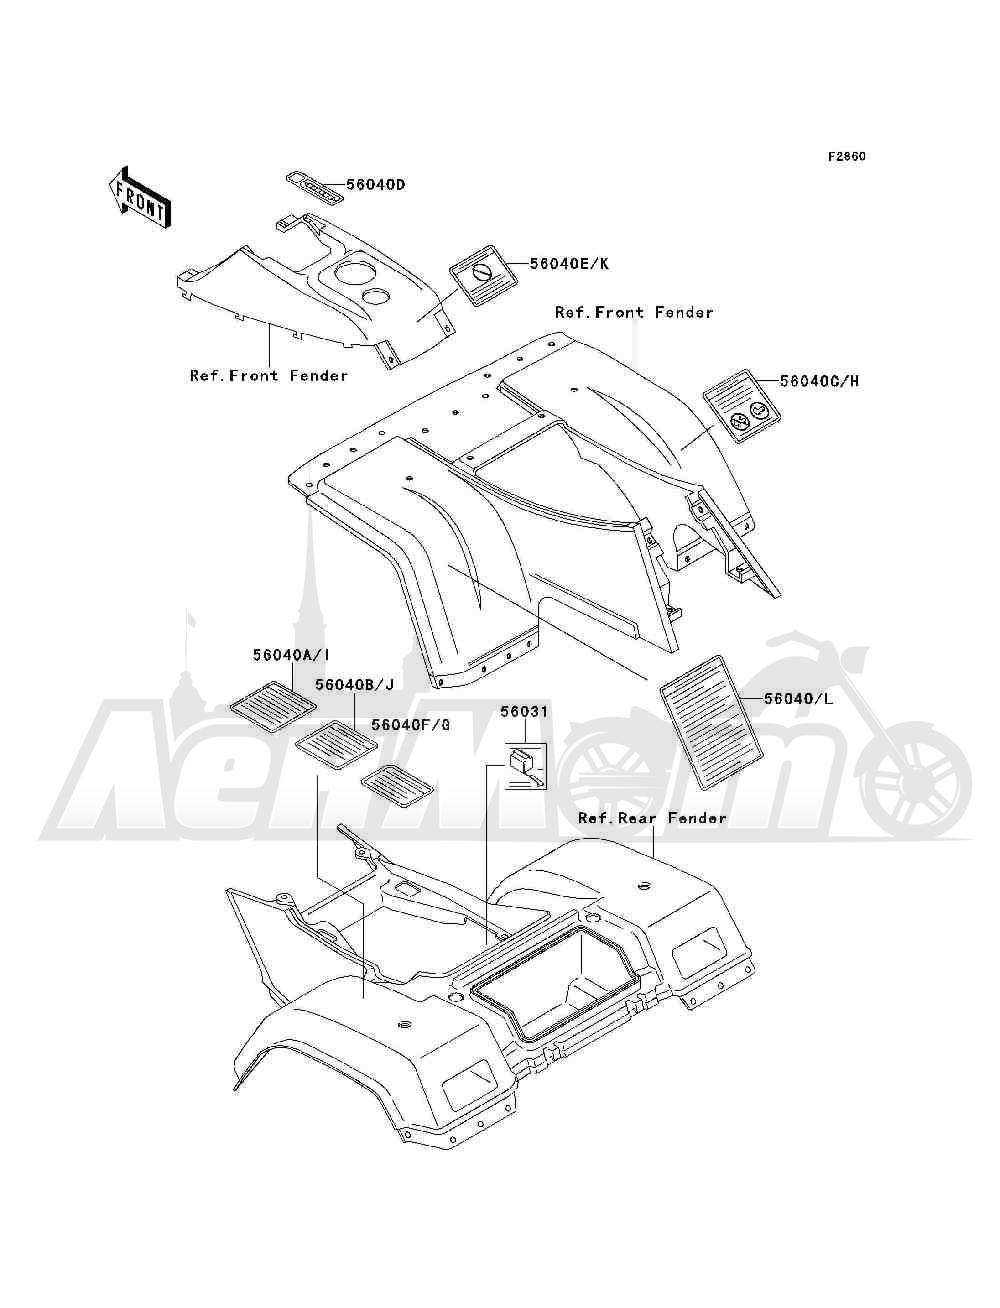 Запчасти для Квадроцикла Kawasaki 1993 BAYOU 300 4X4 (KLF300-C5) Раздел: LABELS   этикетки, метки